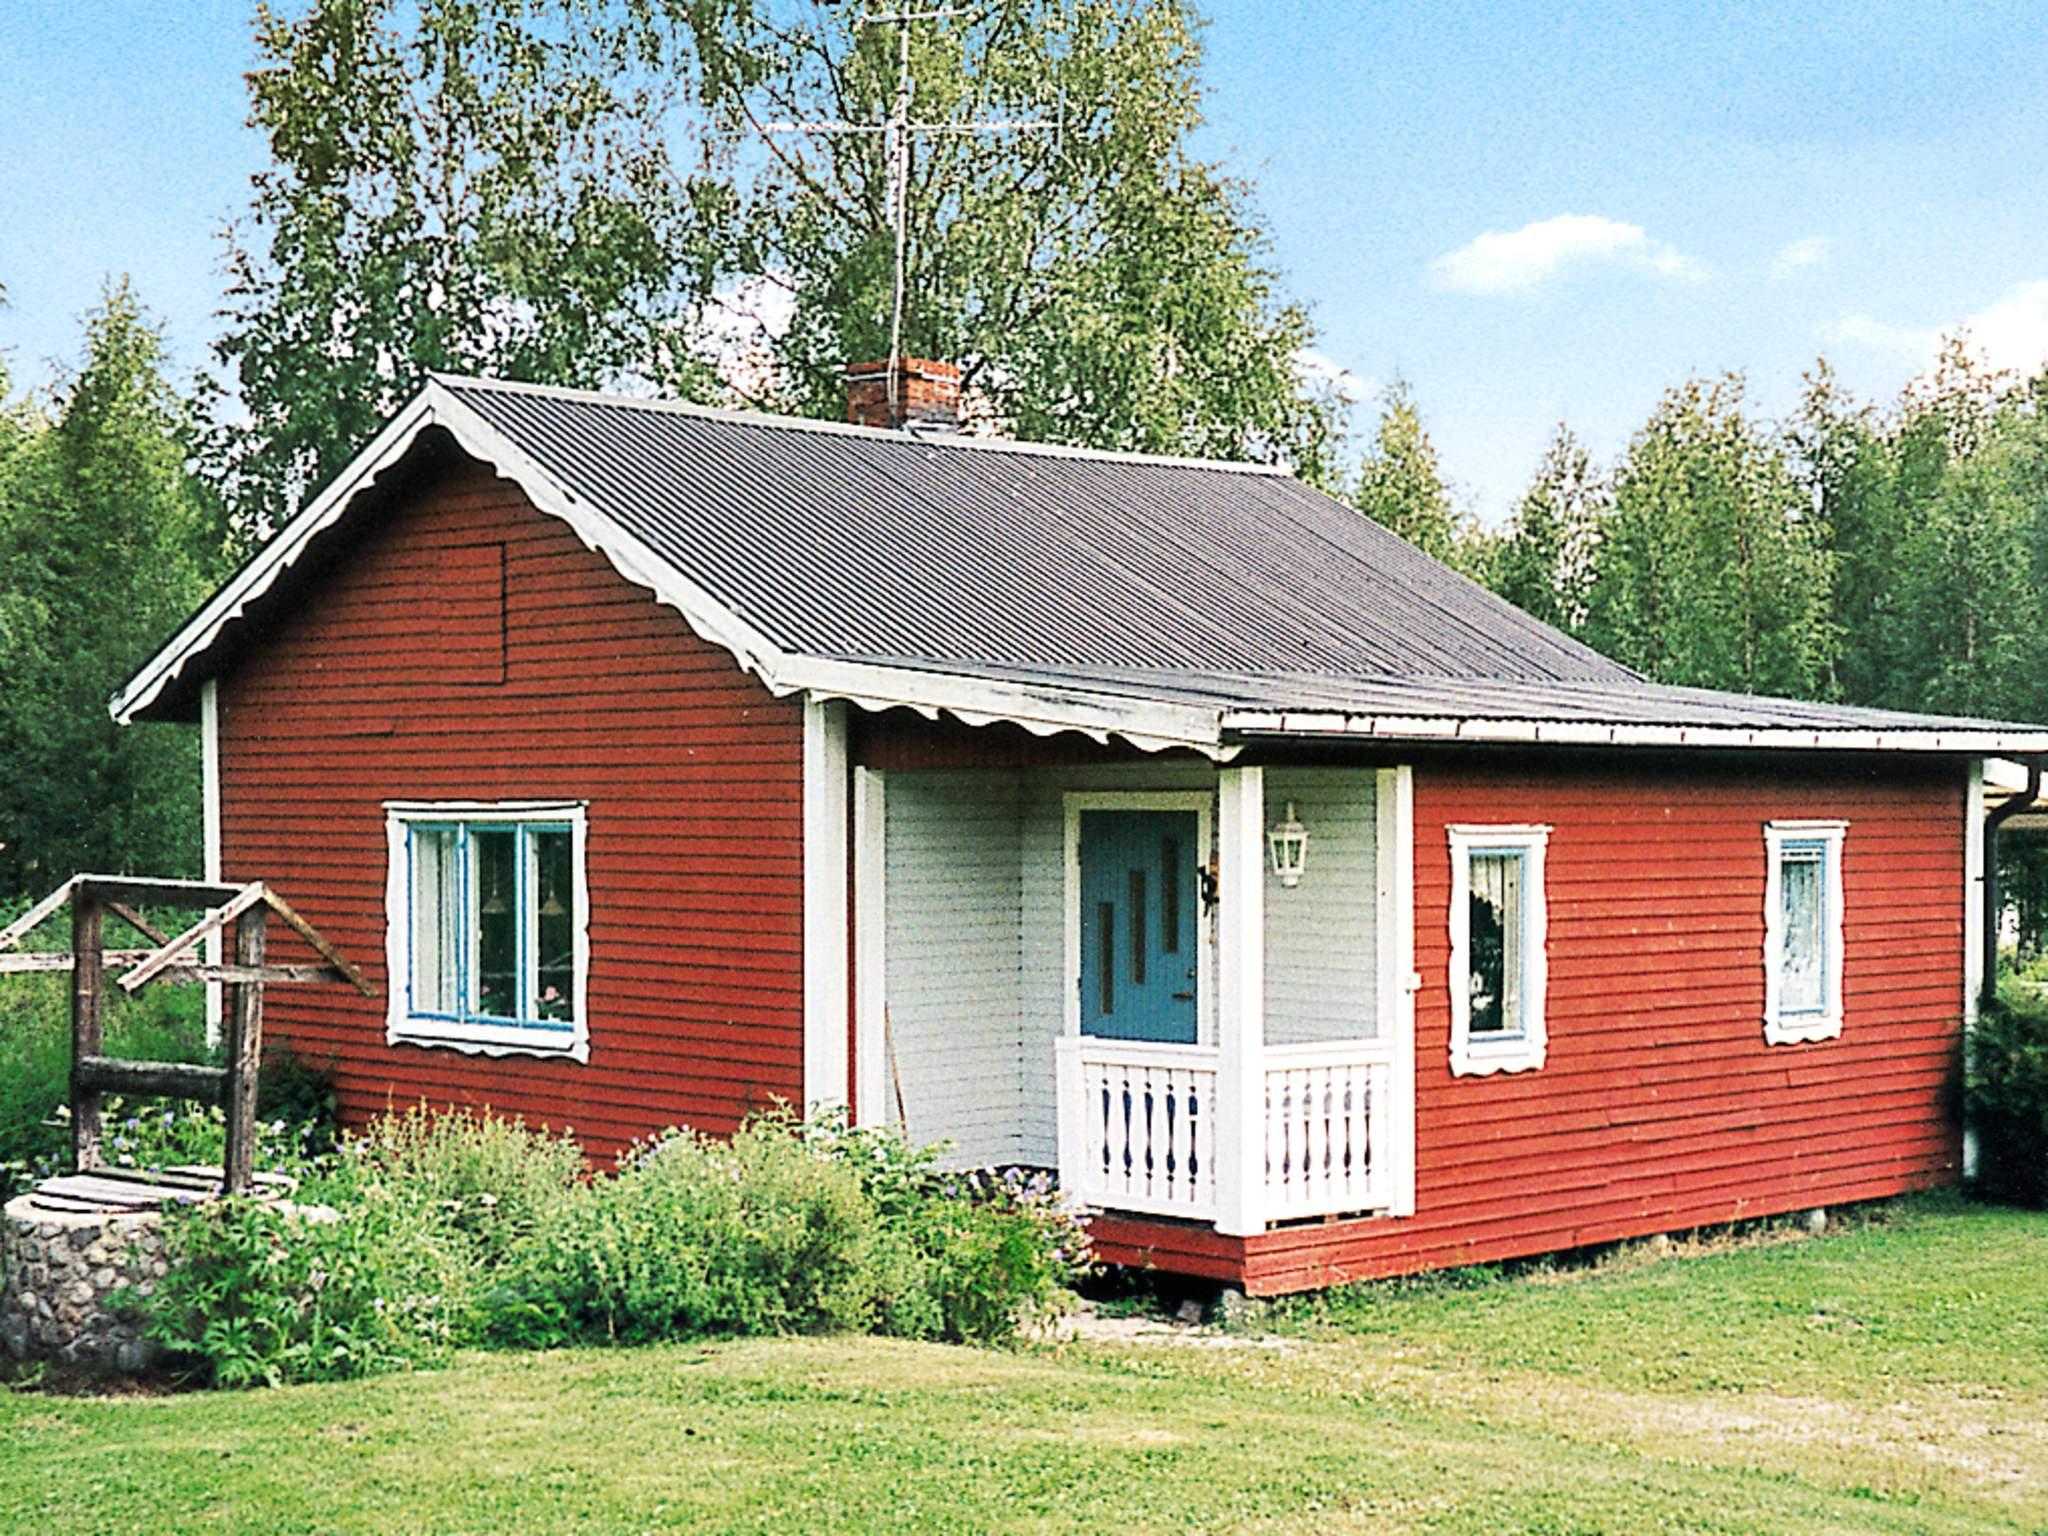 Ferienhaus Kyrknäs (87087), Torsby, Värmlands län, Mittelschweden, Schweden, Bild 1